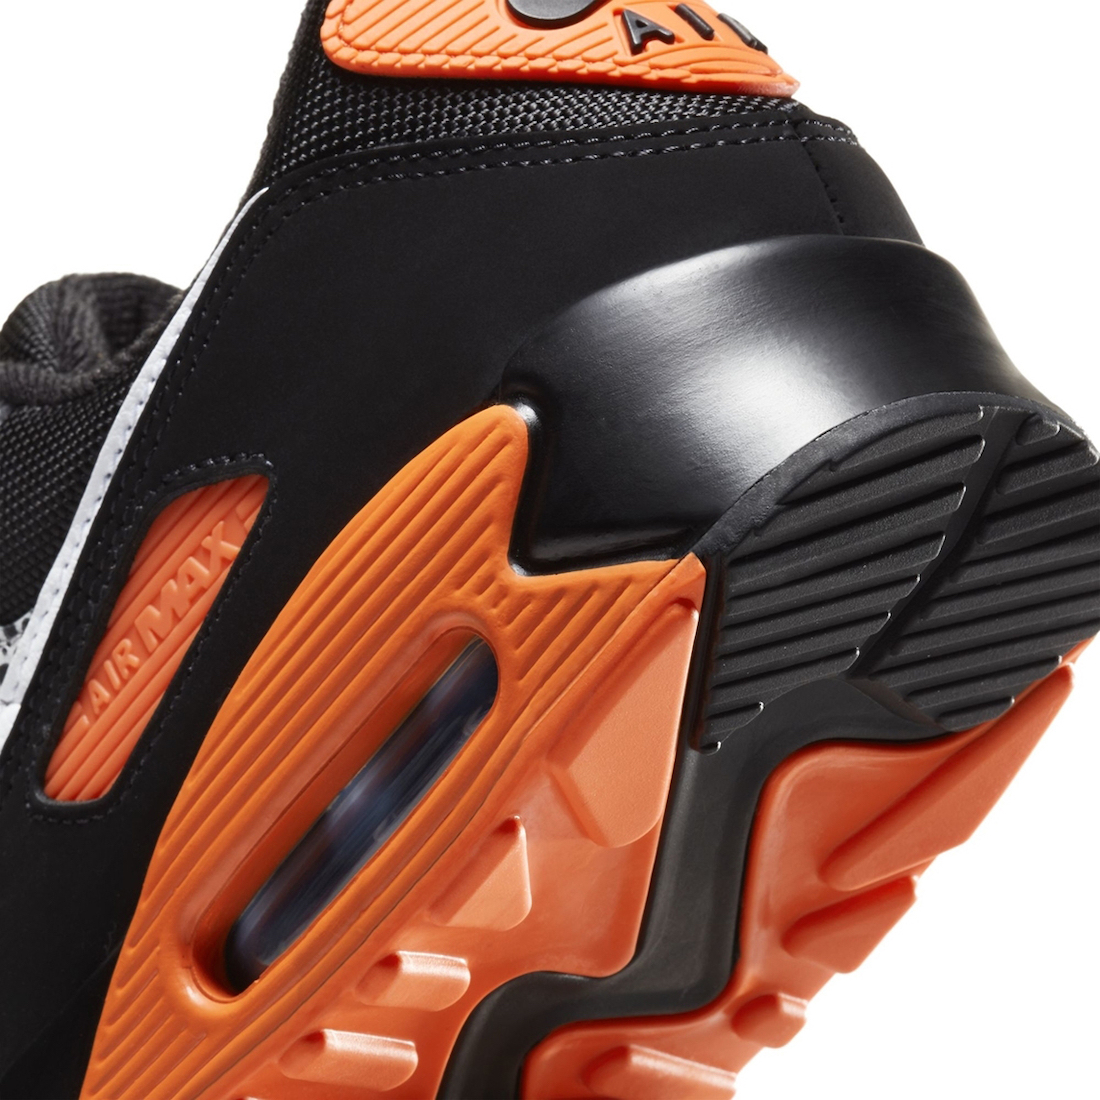 Nike Air Max 90 Safari 2020 Release Date Info